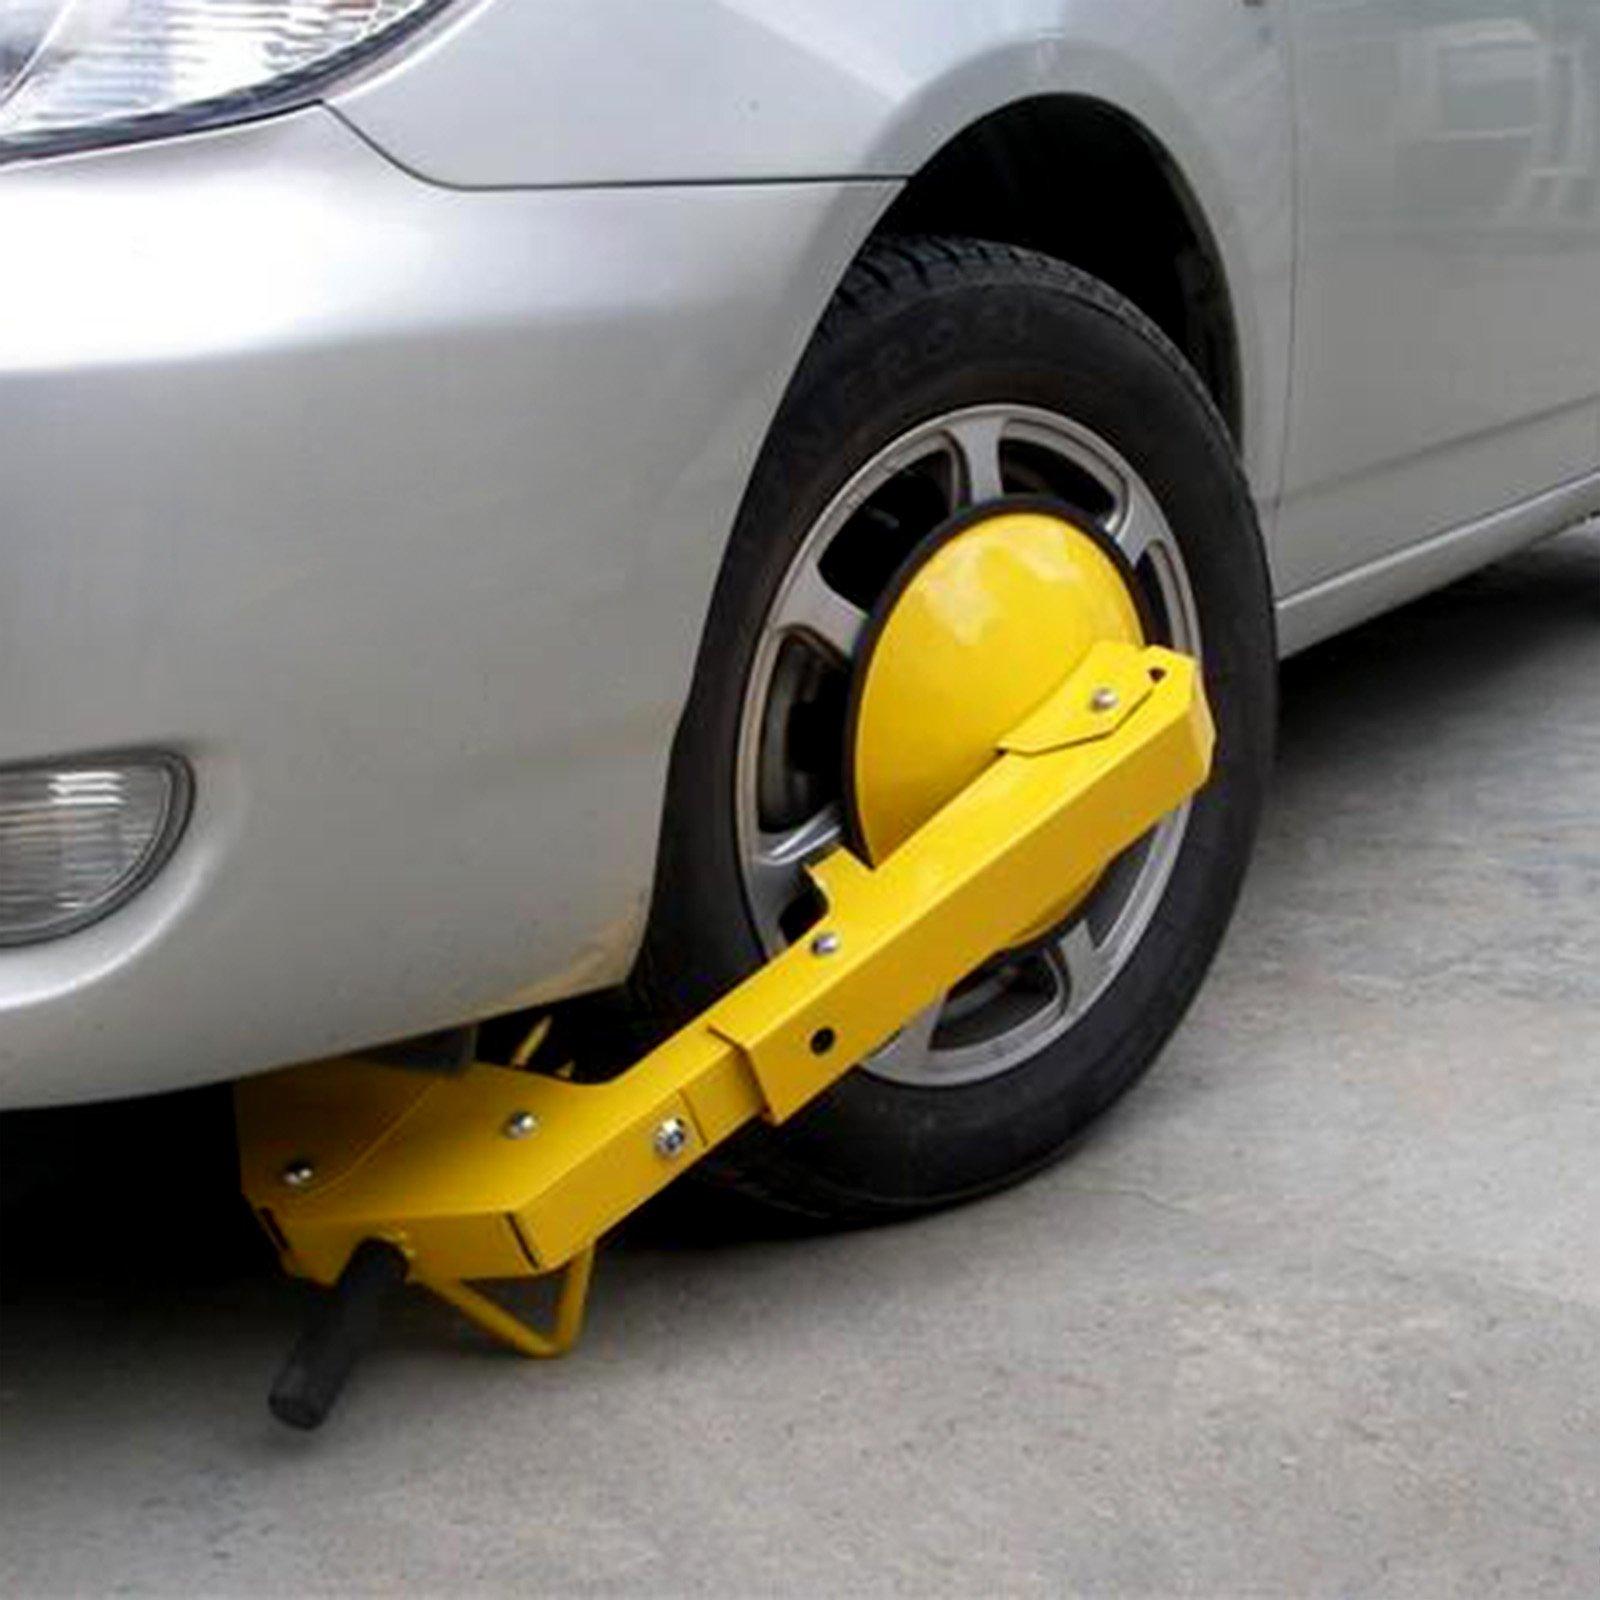 Heavy-duty Wheel Lock Clamp Boot Tire Claw Auto Car Anti Theft Lock for Golf Cart/SUV/Trailers/ATV RV (US Stock)